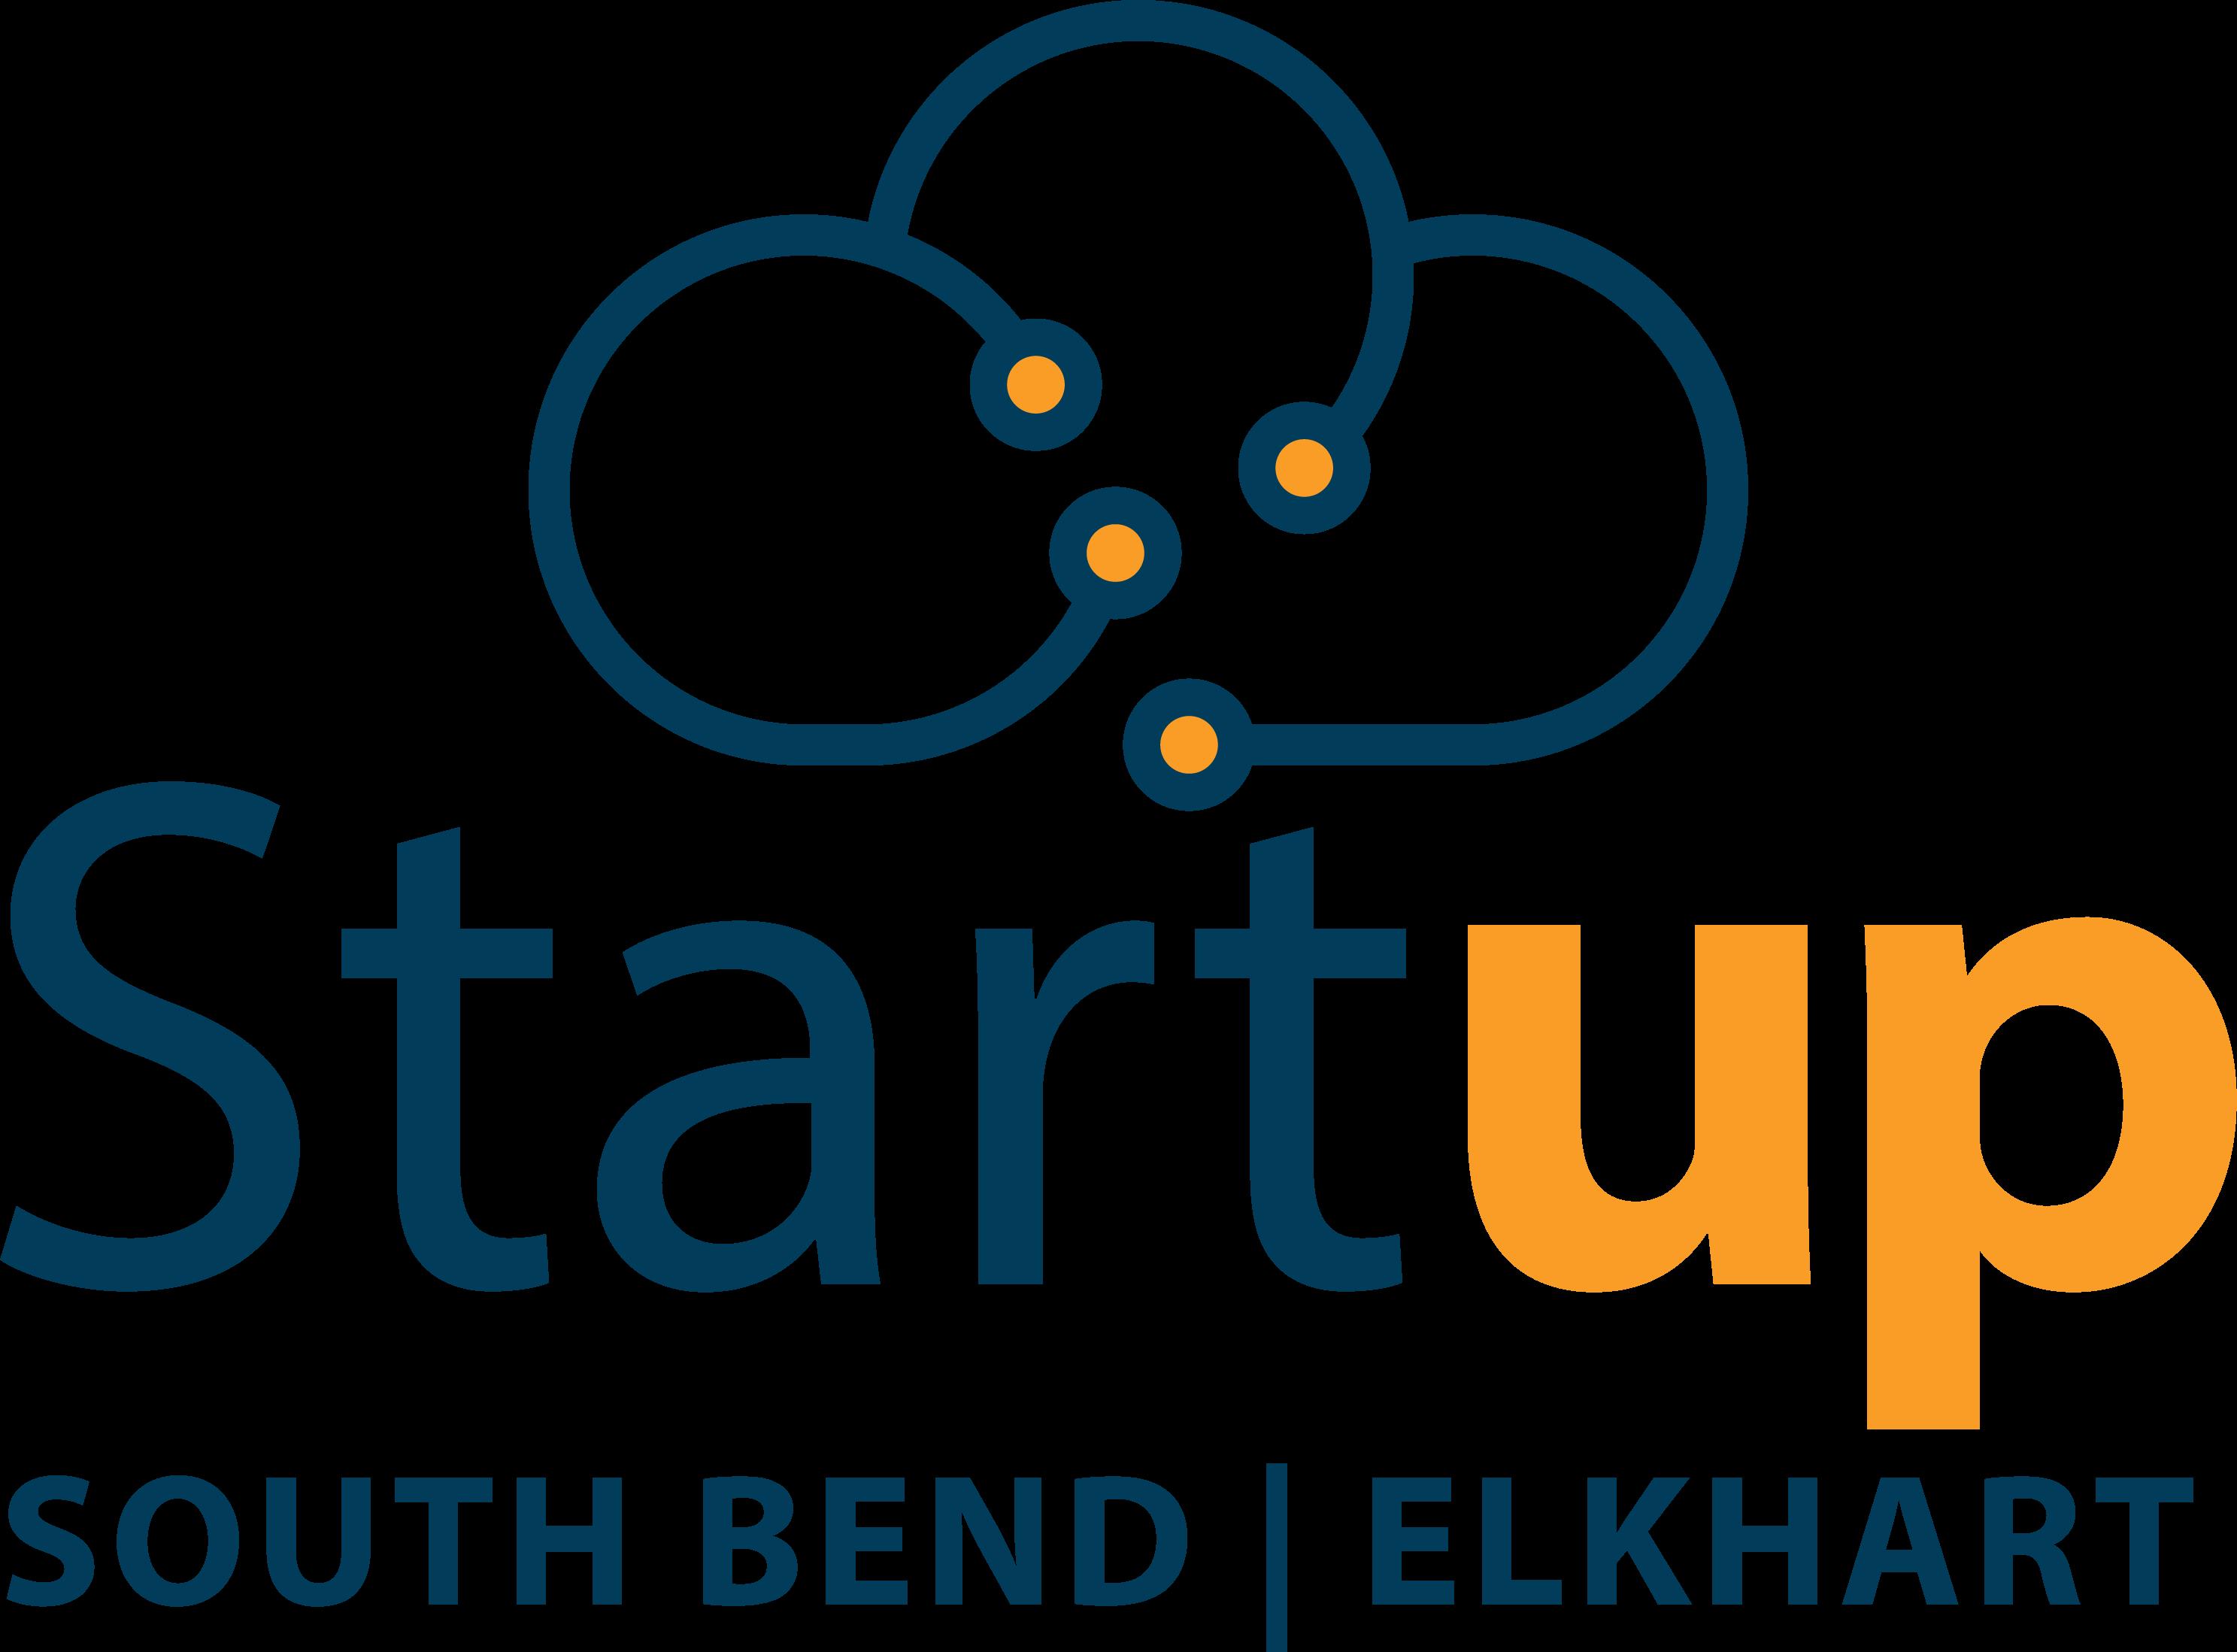 Startup South Bend - Elkhart